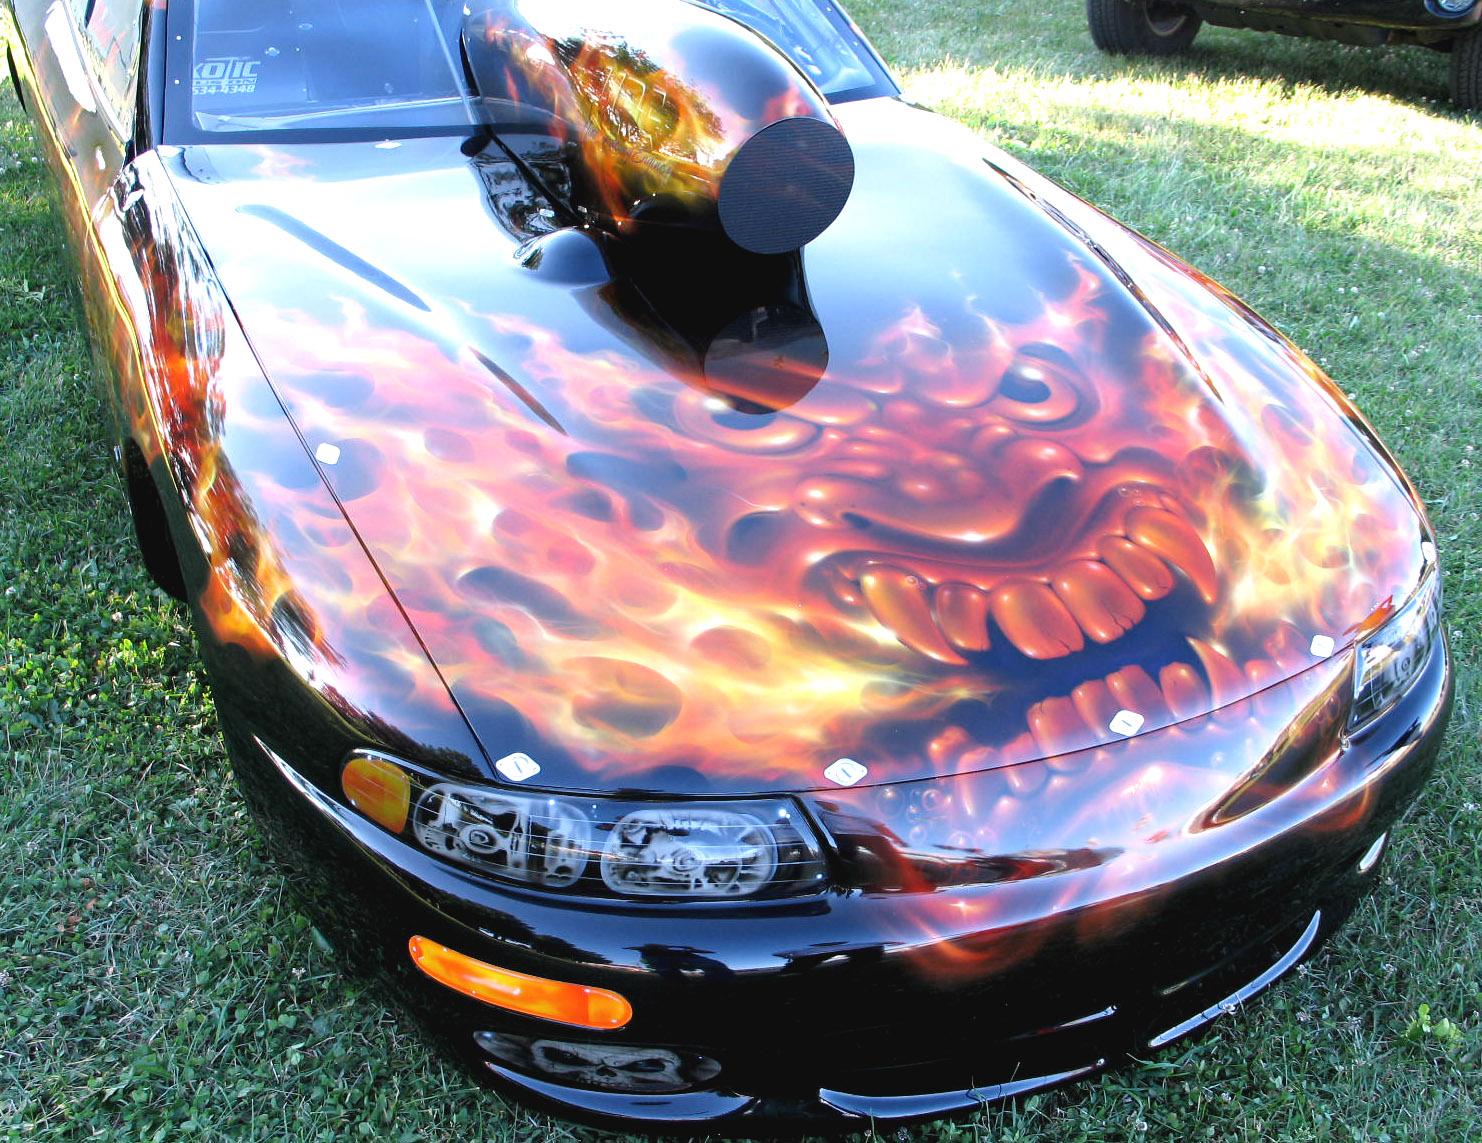 Inspired Ambitions: Airbrush Art on Cars  Inspired Ambiti...